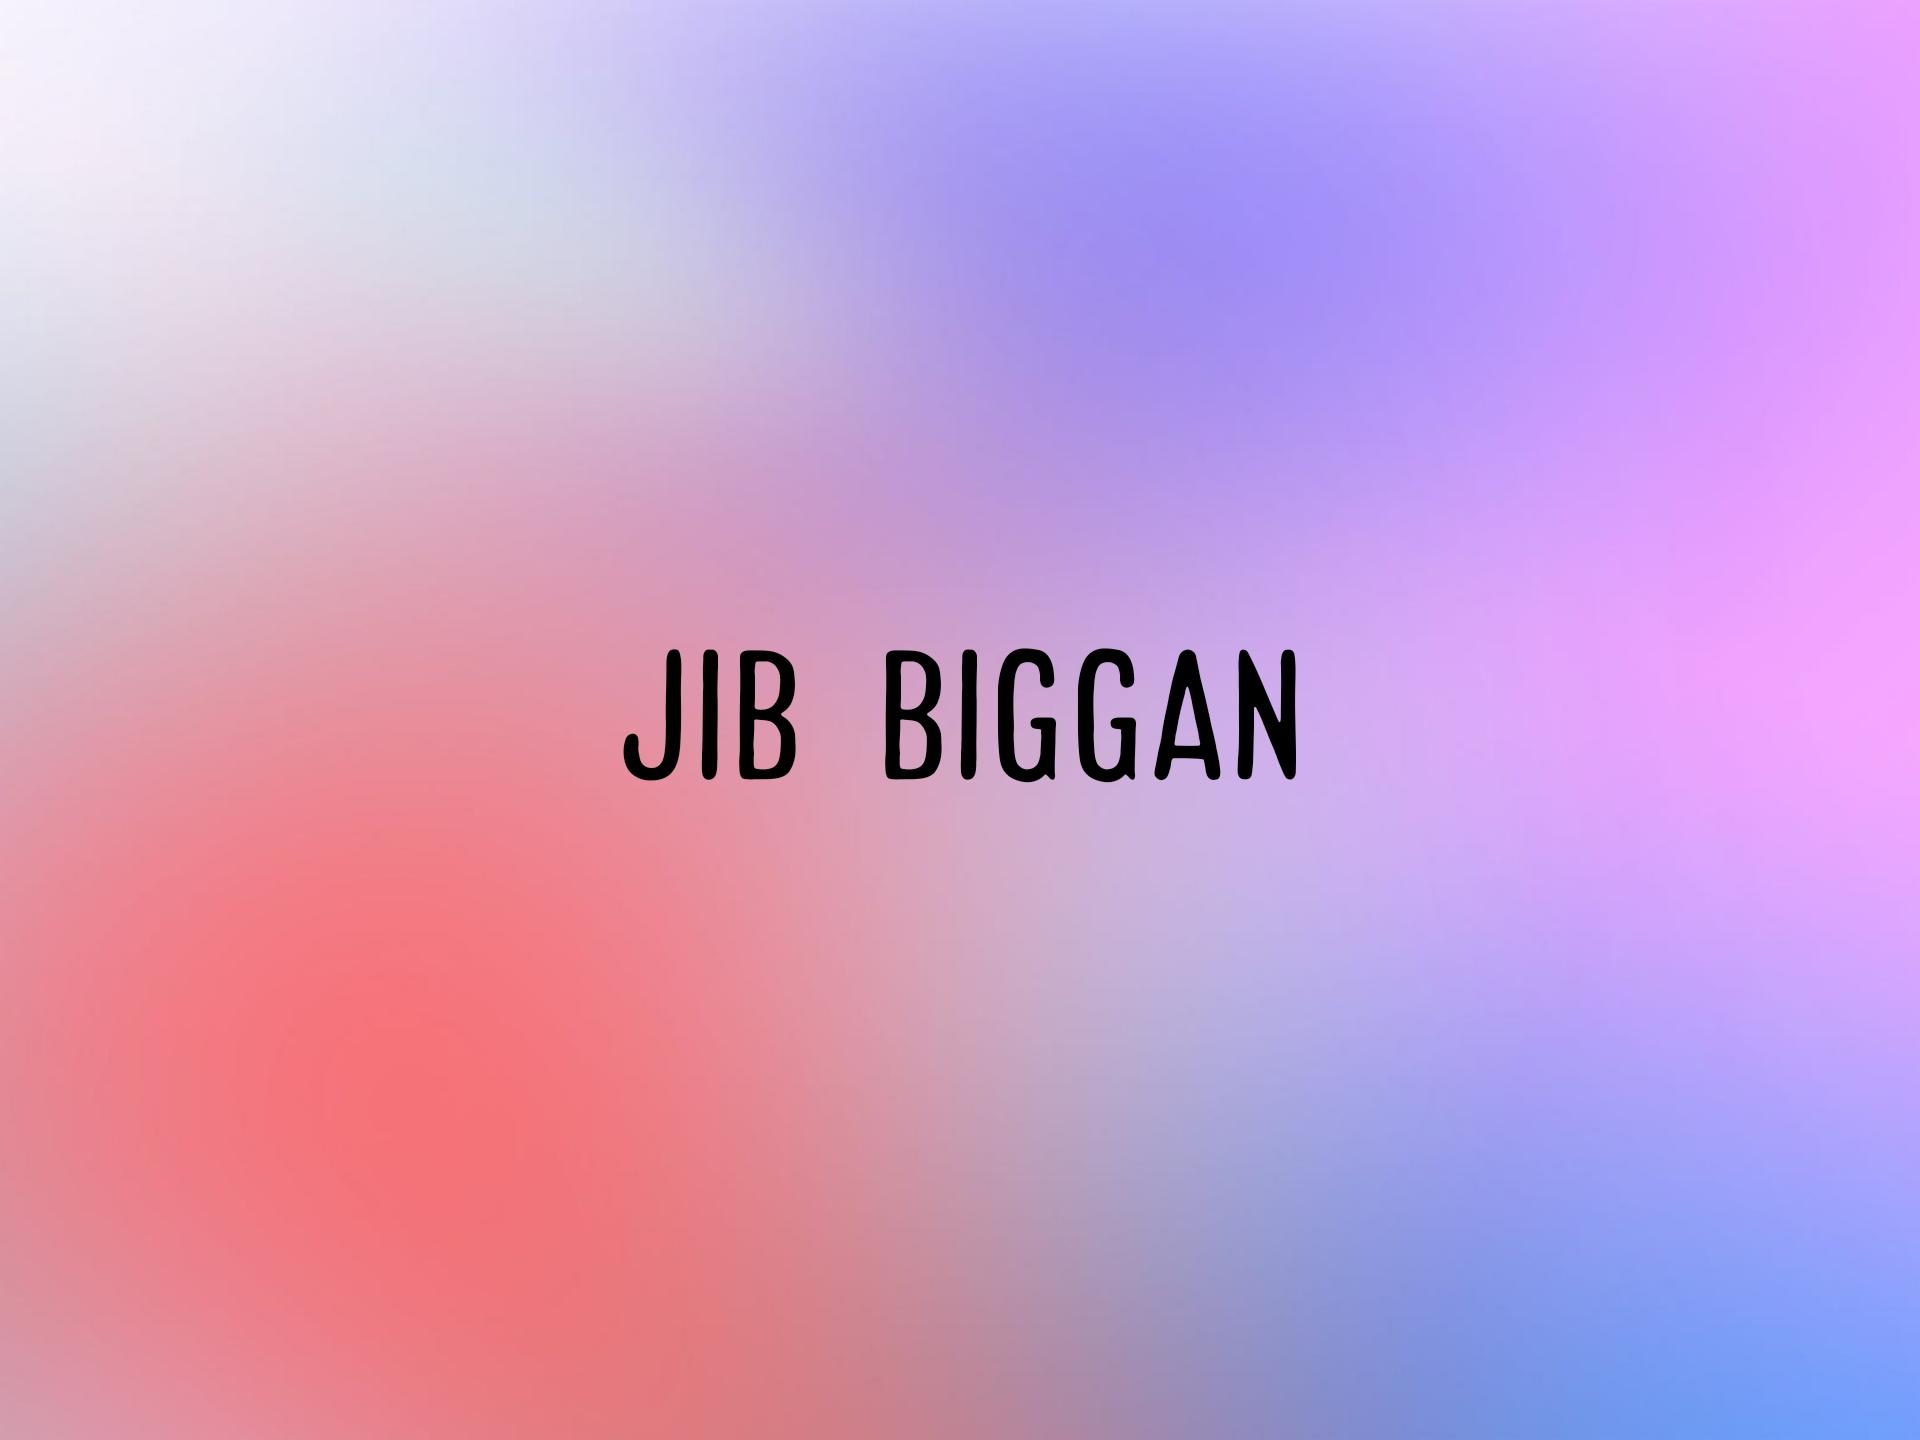 jib biggan pdf file download link, jib biggan pdf file download, jib biggan pdf, jib biggan book,jib biggan pdf file